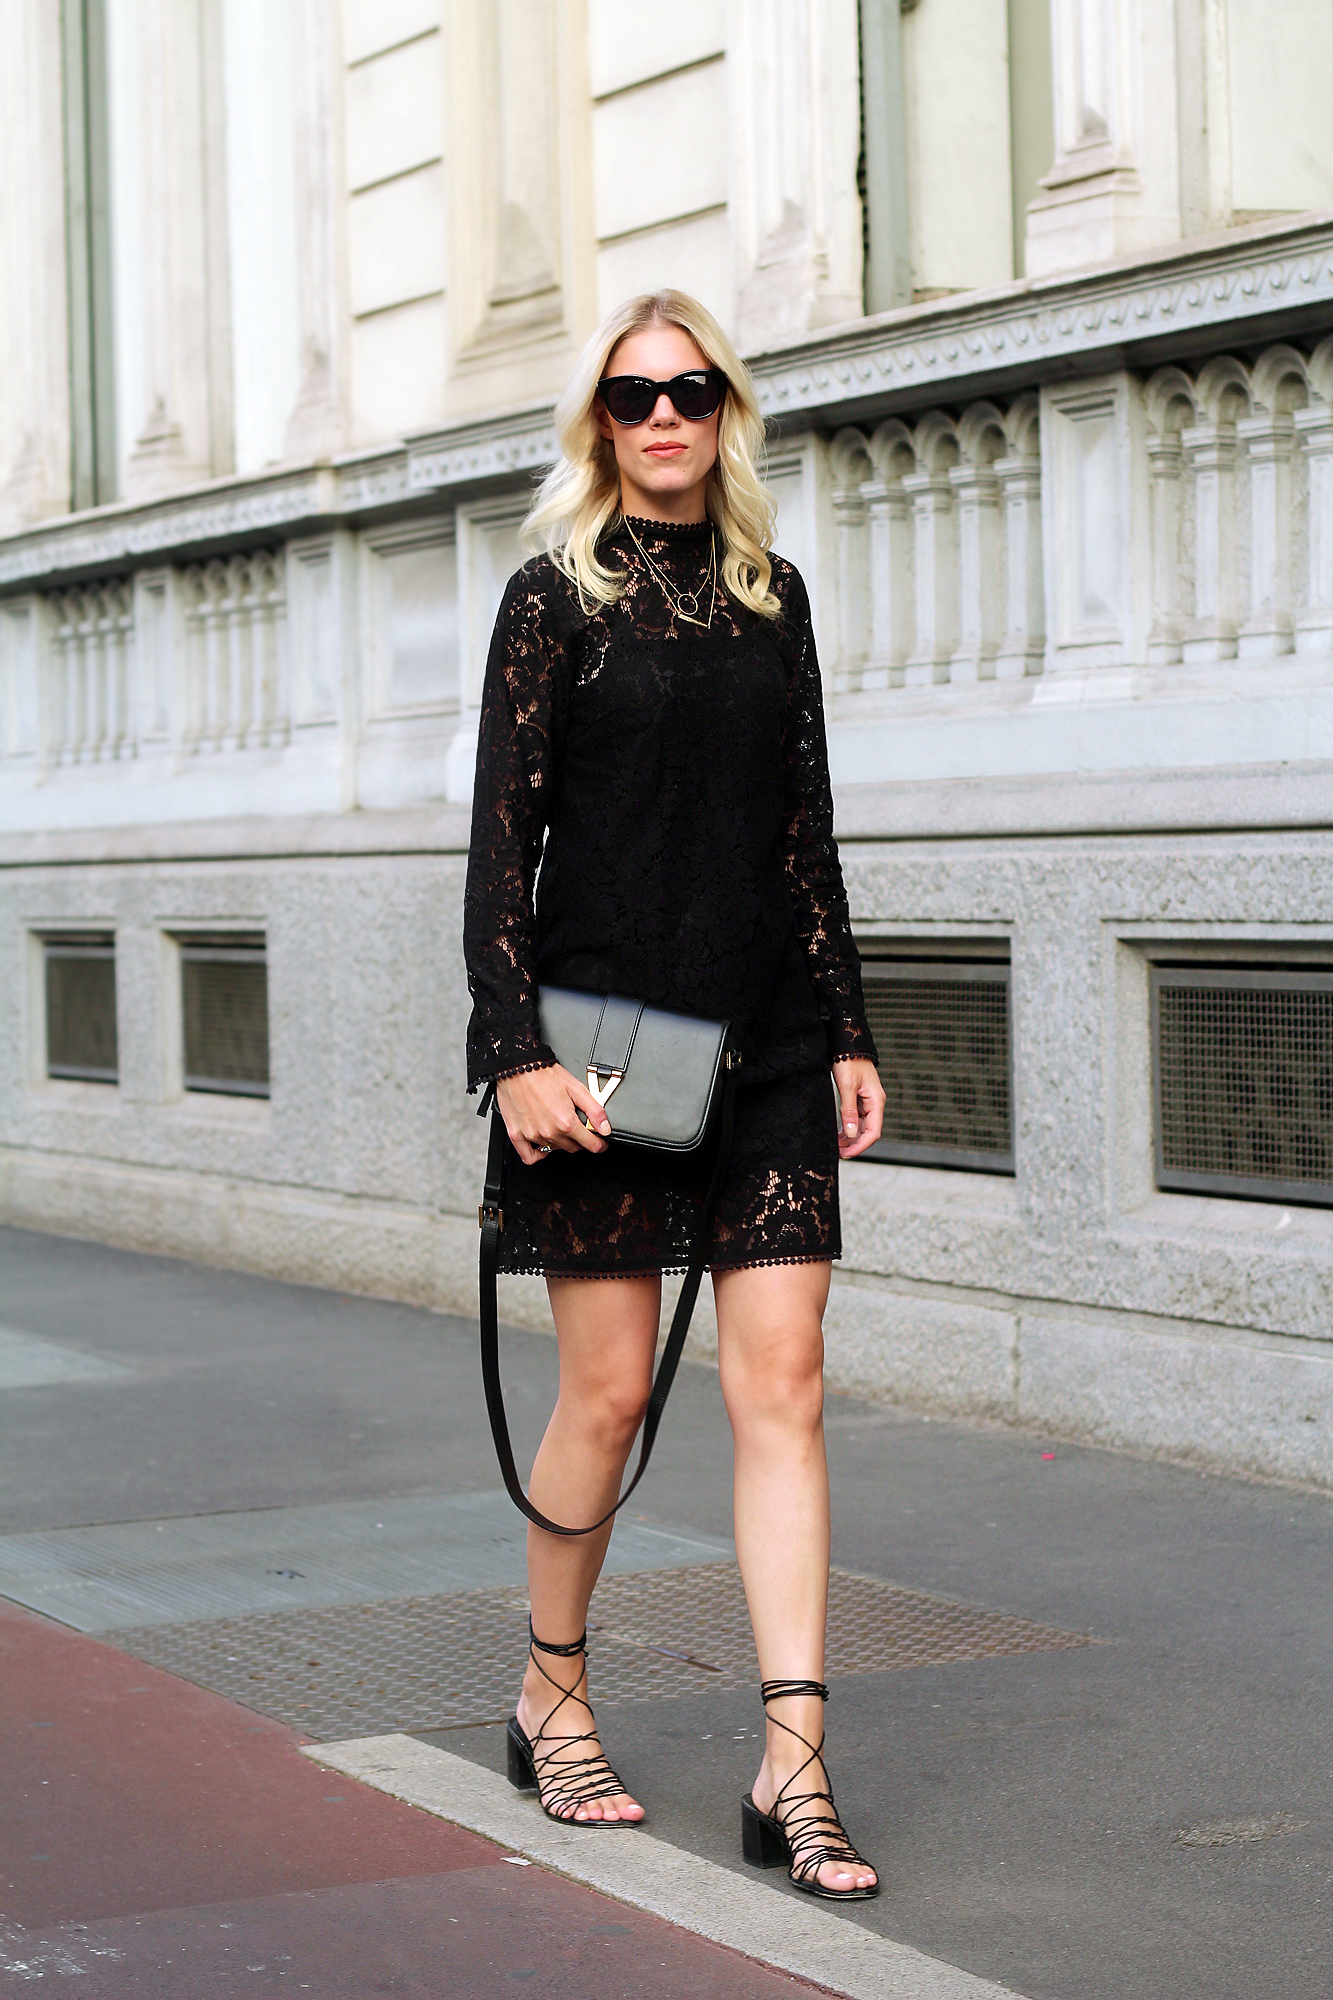 spitzenkleid_hm_dress_lace_somehappyshoes